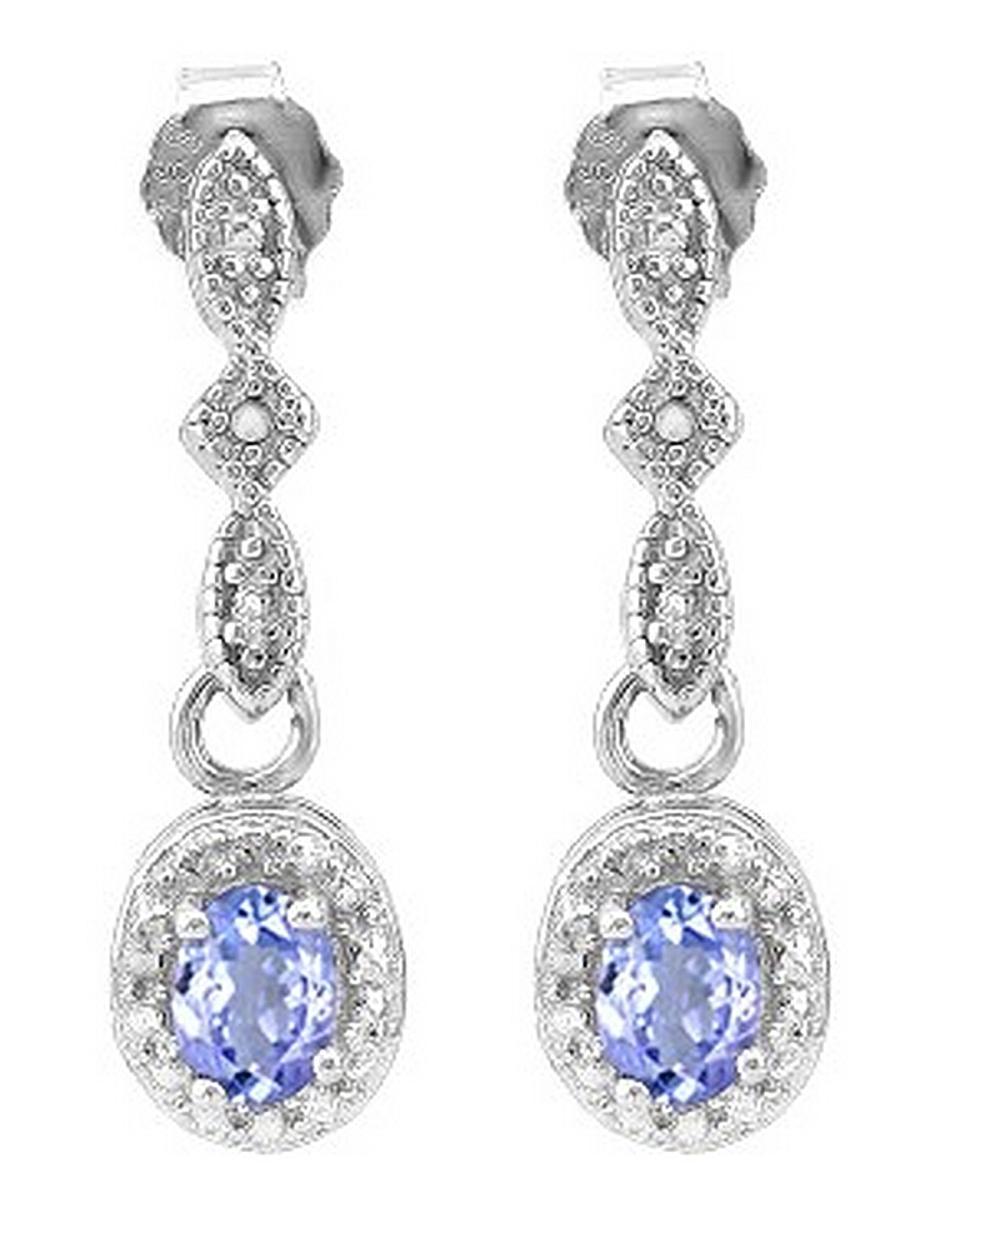 Tanzanite and Diamond Dangle Earrings in Sterling Silver